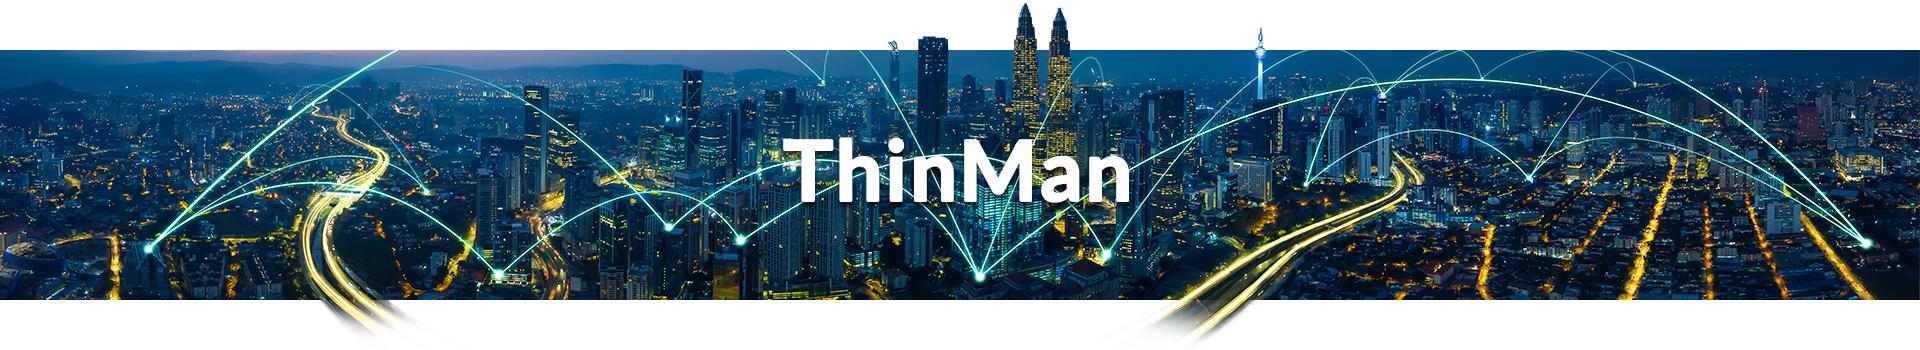 ThinMan